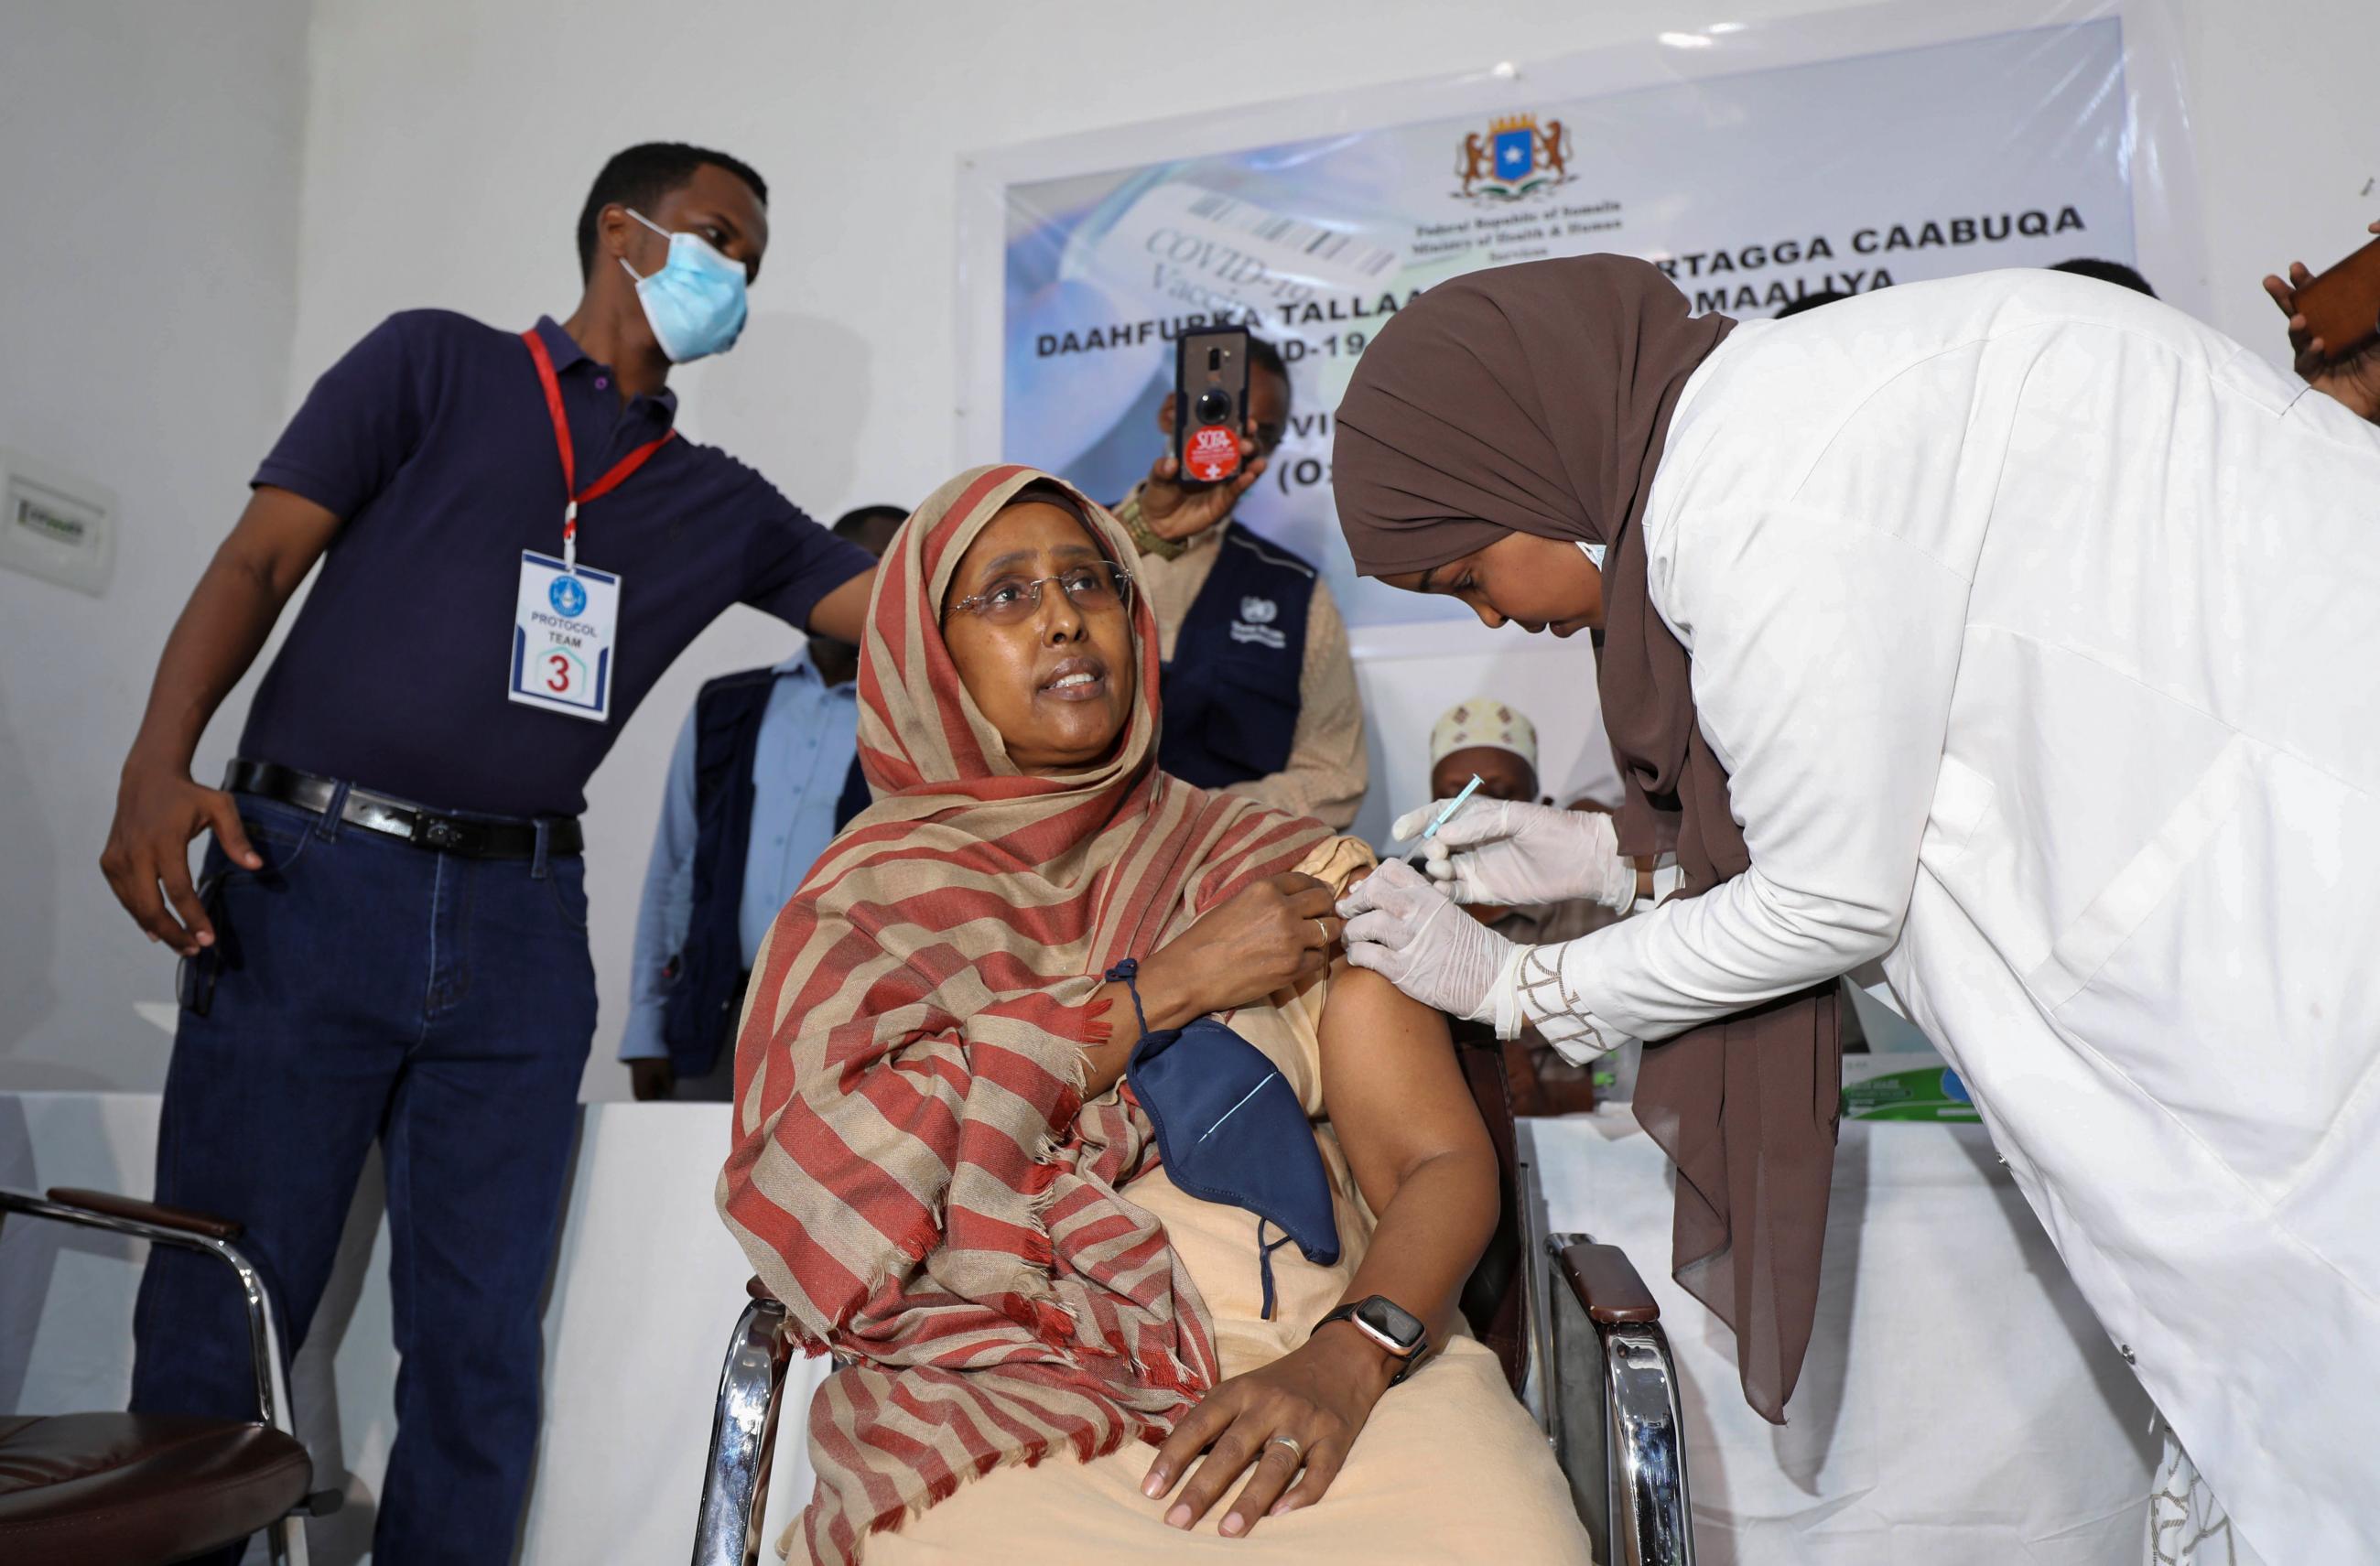 Somalia's health minister Fawziya Abikar Nur receives the AstraZeneca/Oxford vaccine (supplied via COVAX) at the Martini Hospital in Mogadishu, Somalia on March 16, 2021. REUTERS/Feisal Omar